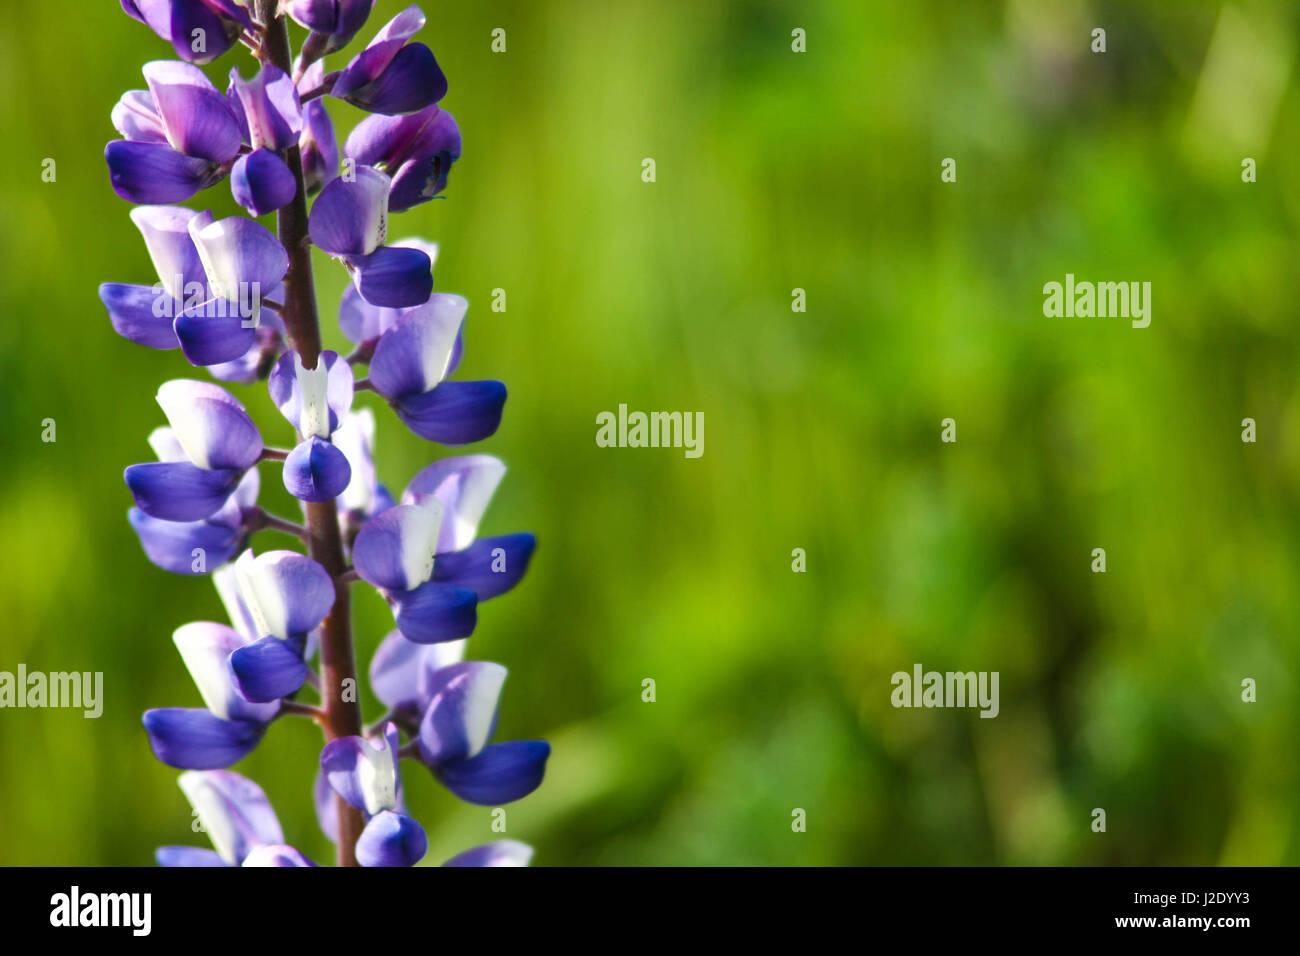 Lilac64174214   - Stock Image